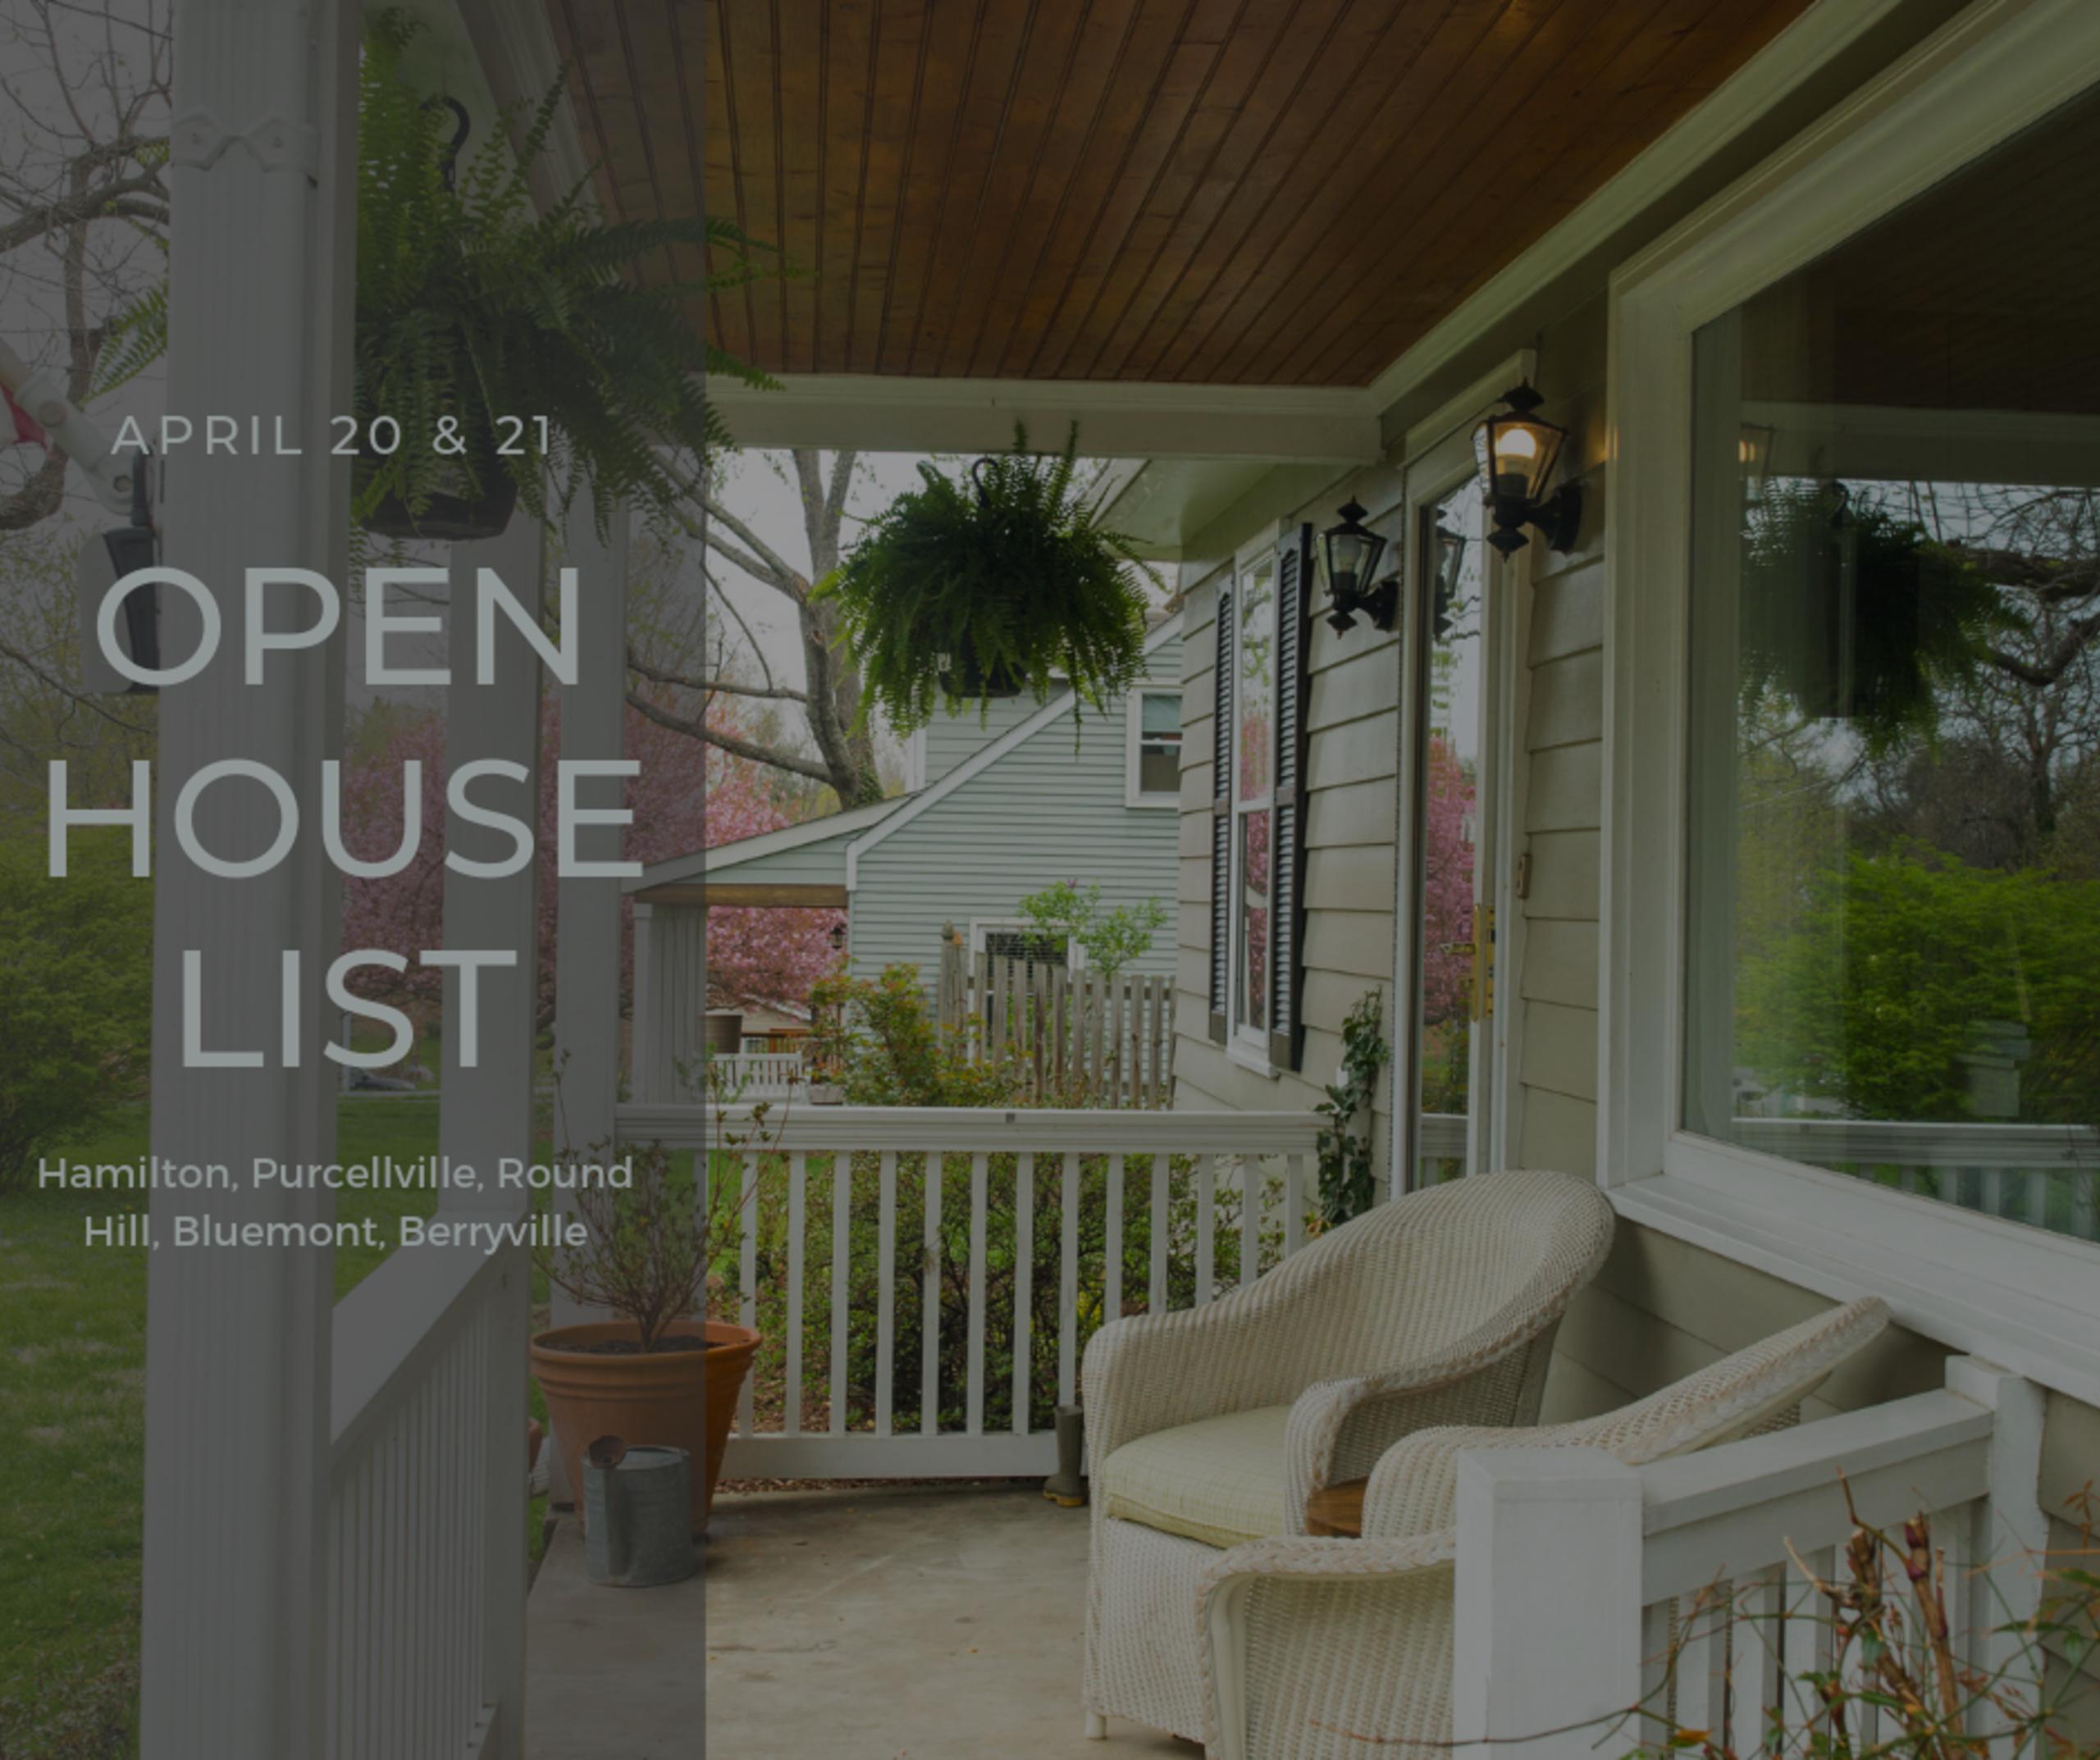 Open House List 4/20/19 – 4/20/19